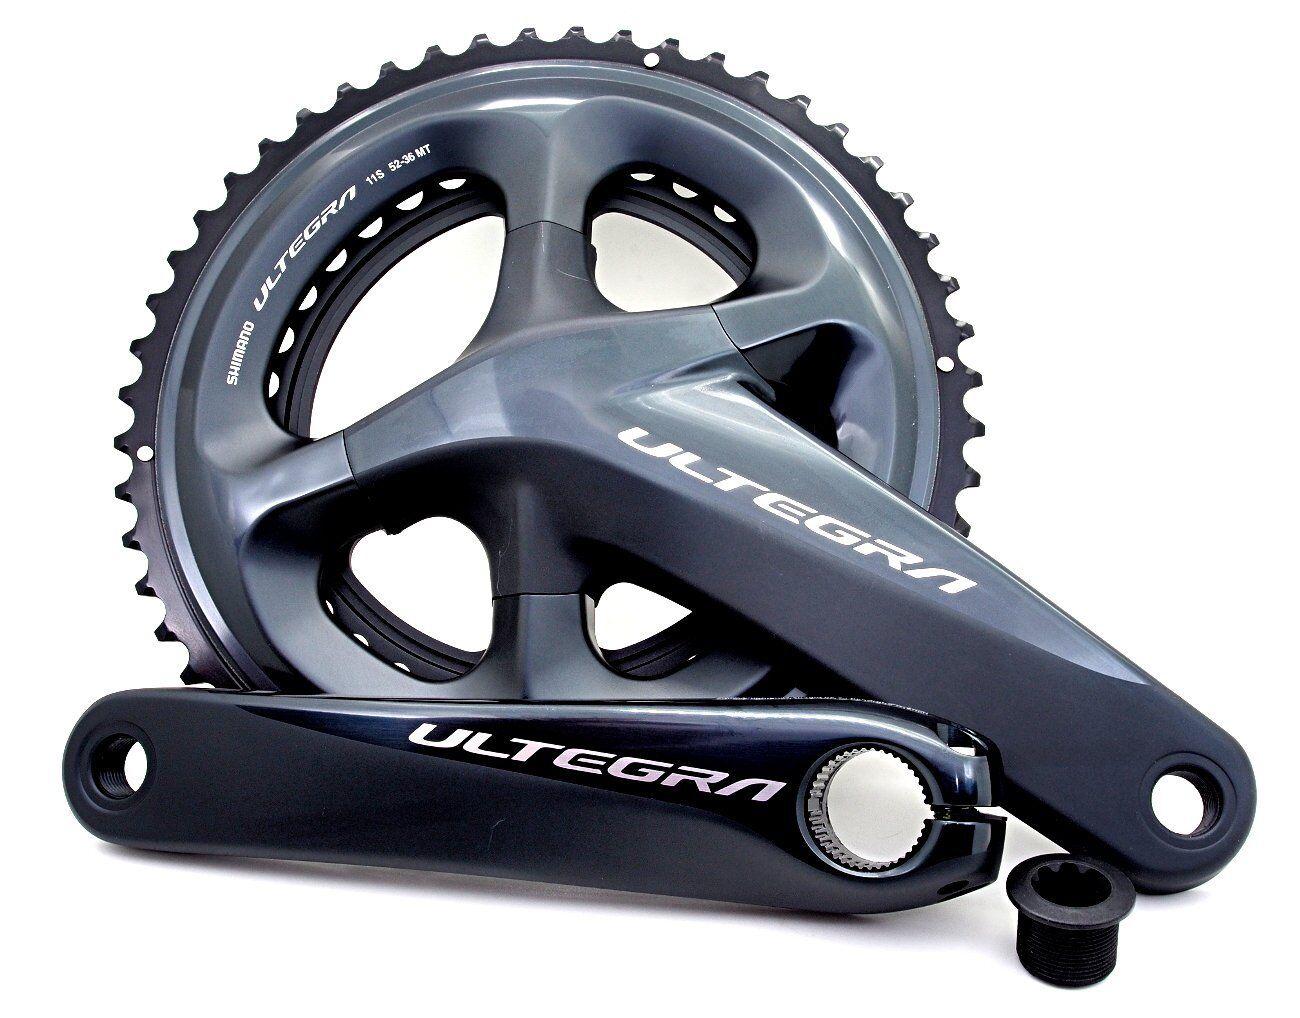 Shimano Ultegra FC-R8000 52-36T 11 Speed Crank Set 165mm